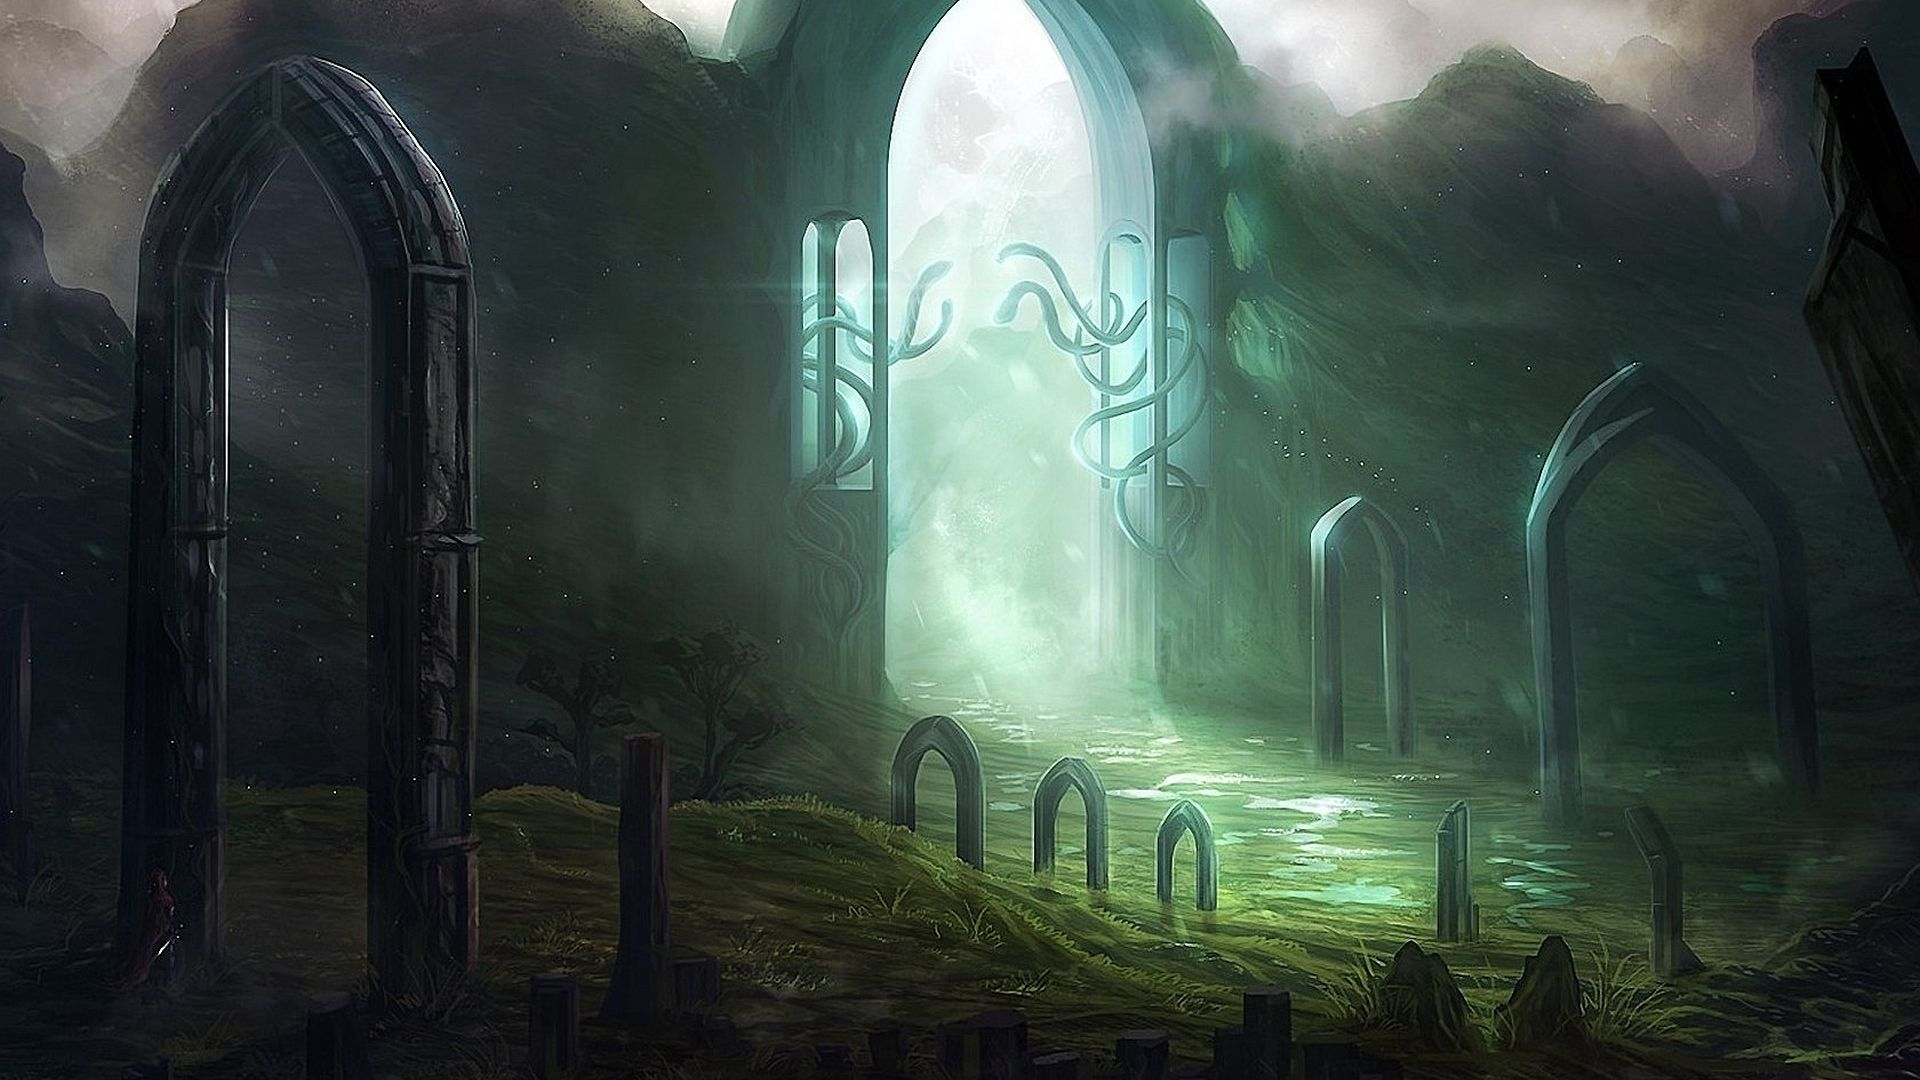 Light through the gates Wallpaper 50947 1920x1080